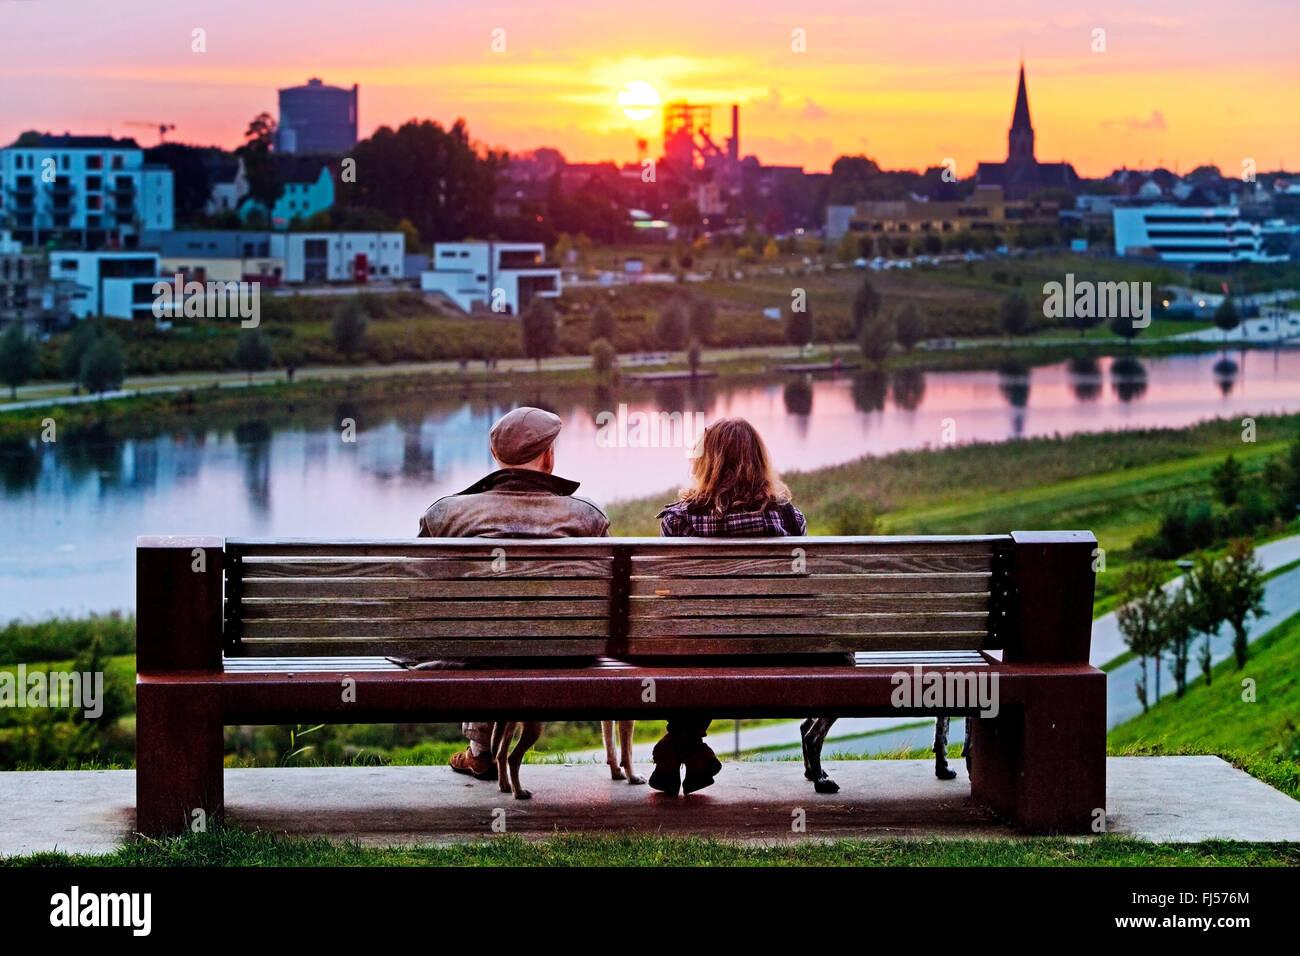 Man Sitting On Bench At Sunset Imágenes De Stock & Man